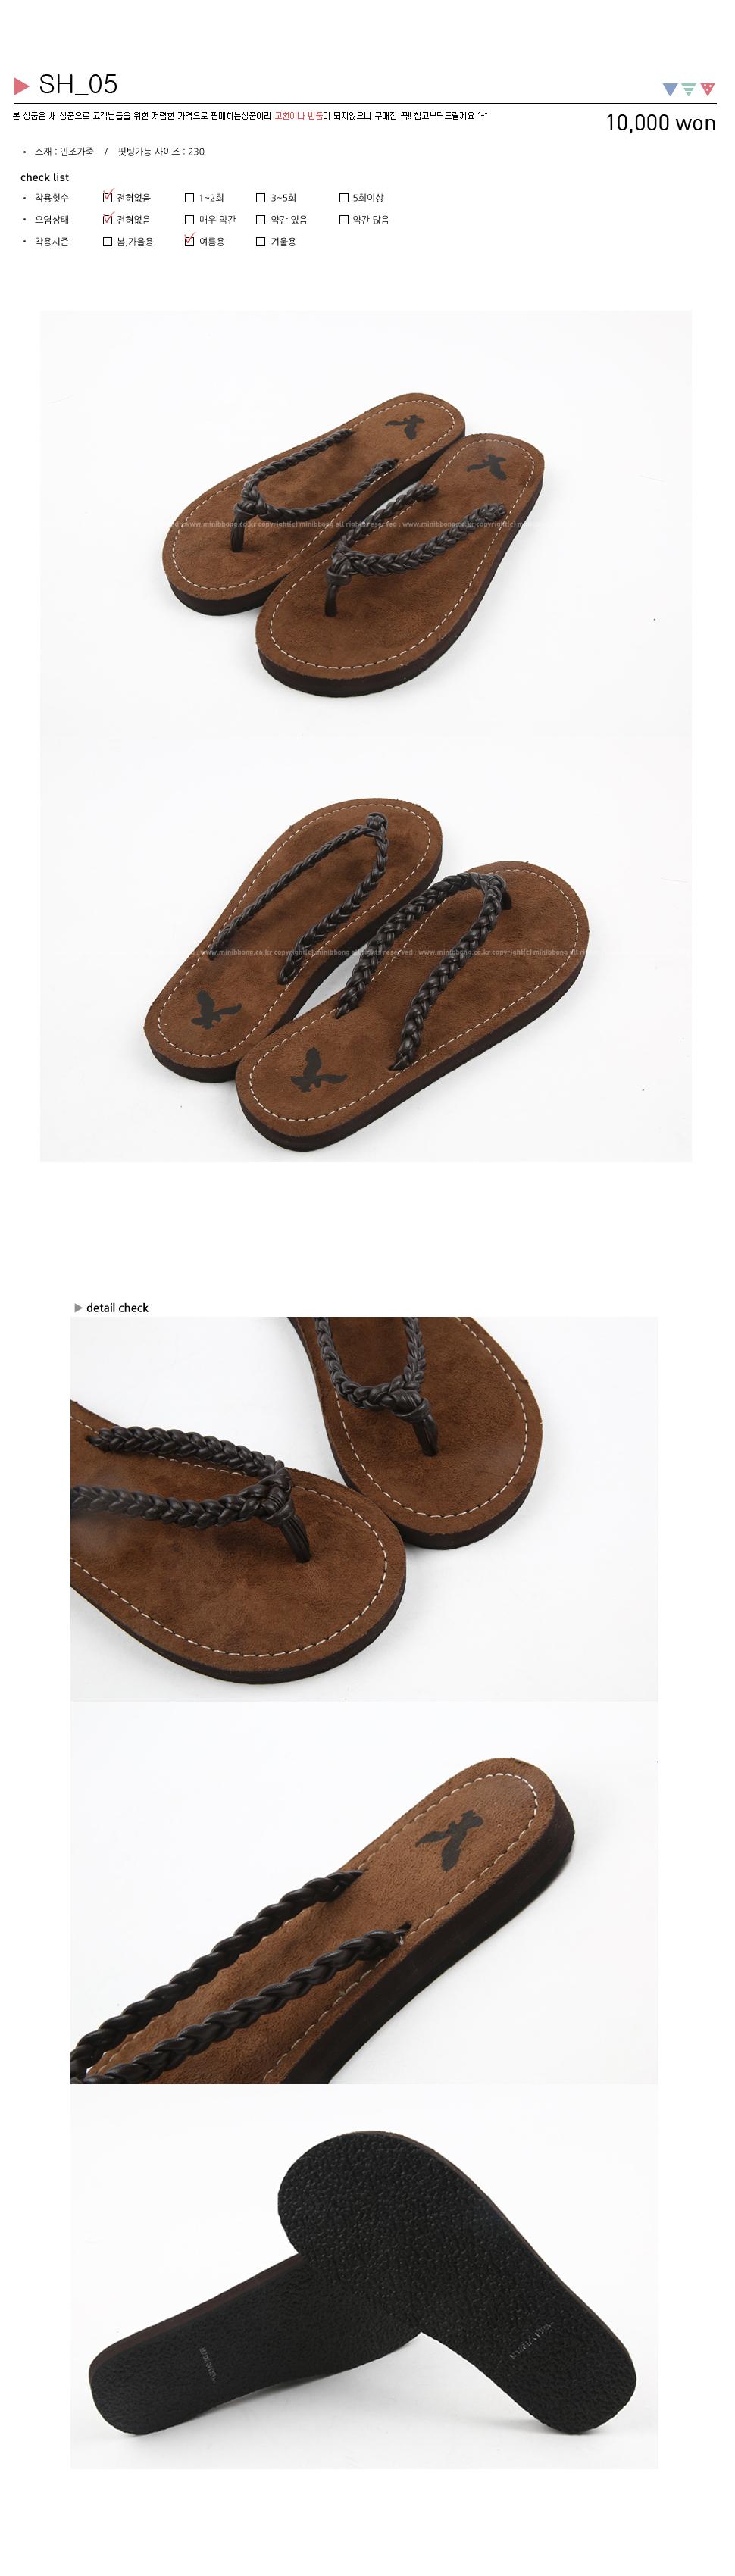 New Product_SALE Summer Shoes_Jori